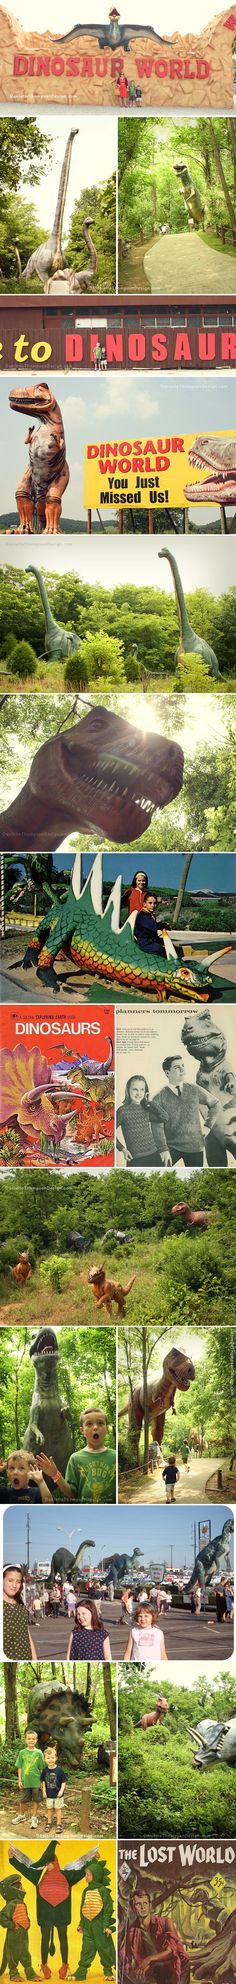 Dinosaur World - Kentucky. My kids would love this!